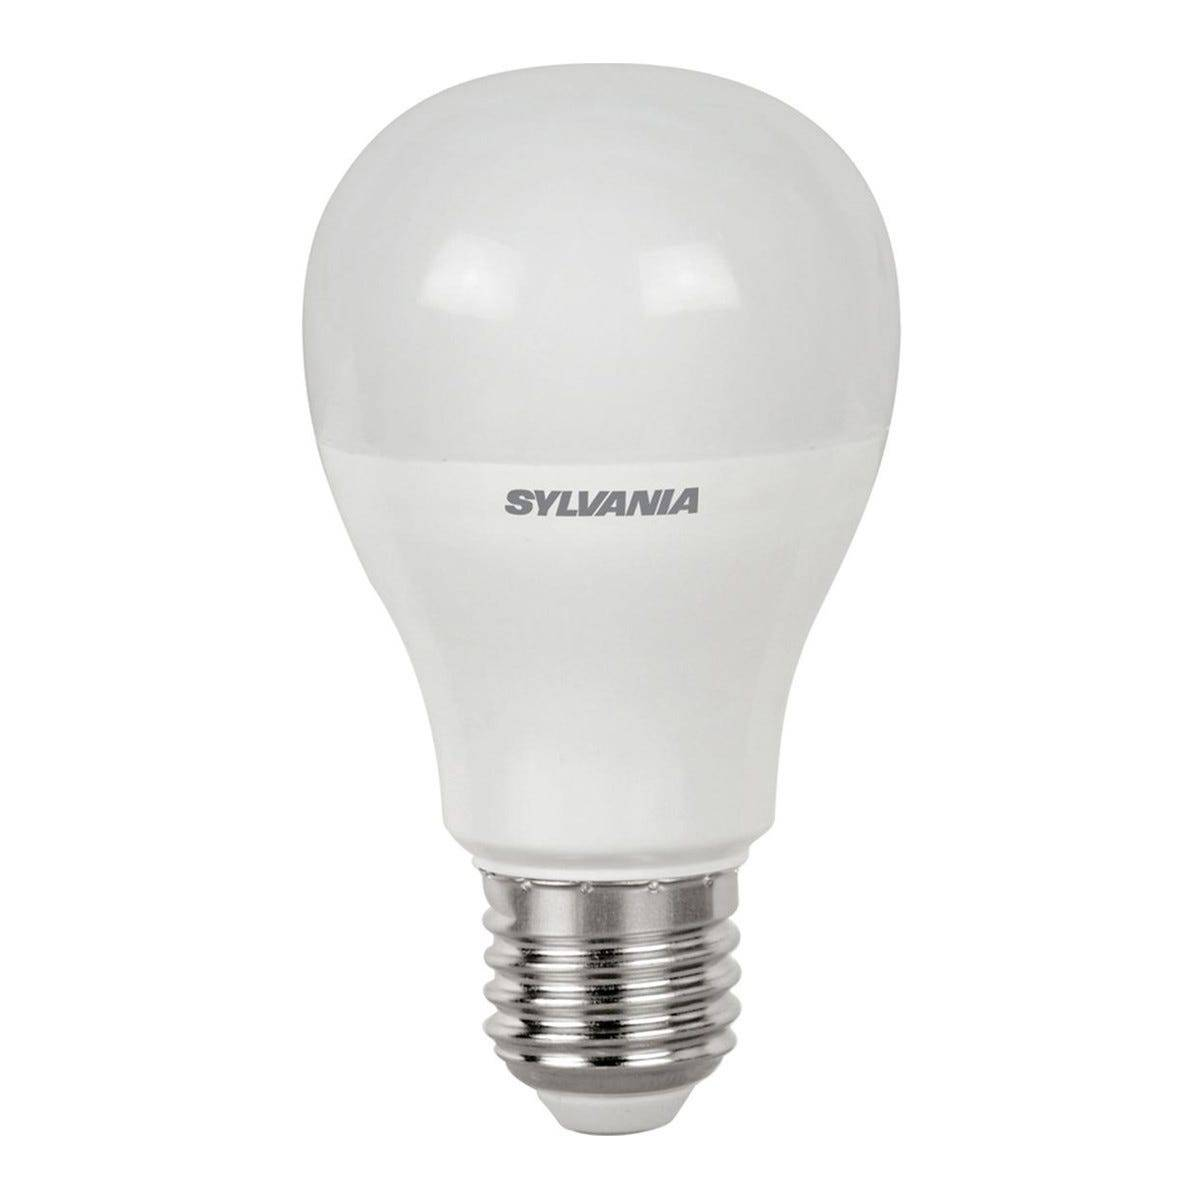 feilo_sylvania lampadina sylvania led goccia e27 11w=80w 1150 lumen 6500k luce fredda dimmerabile